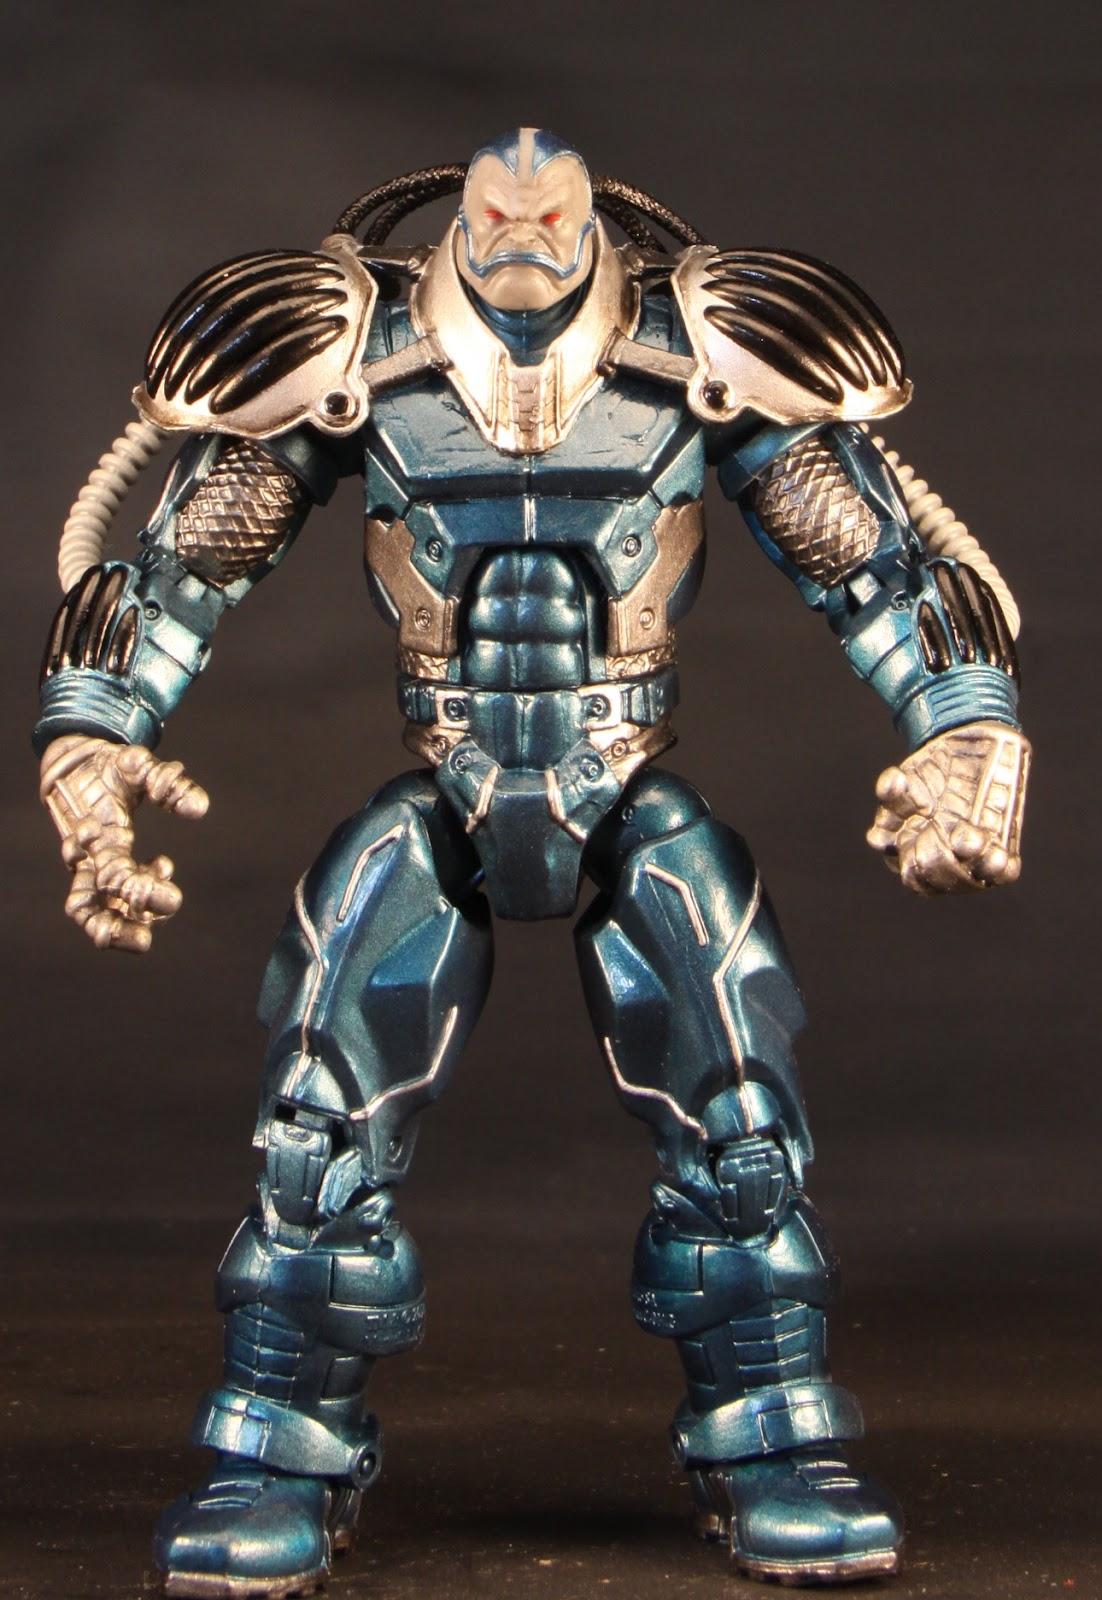 Marvel Universe BAF Apocalypse FULLY LOADED - Toy ...